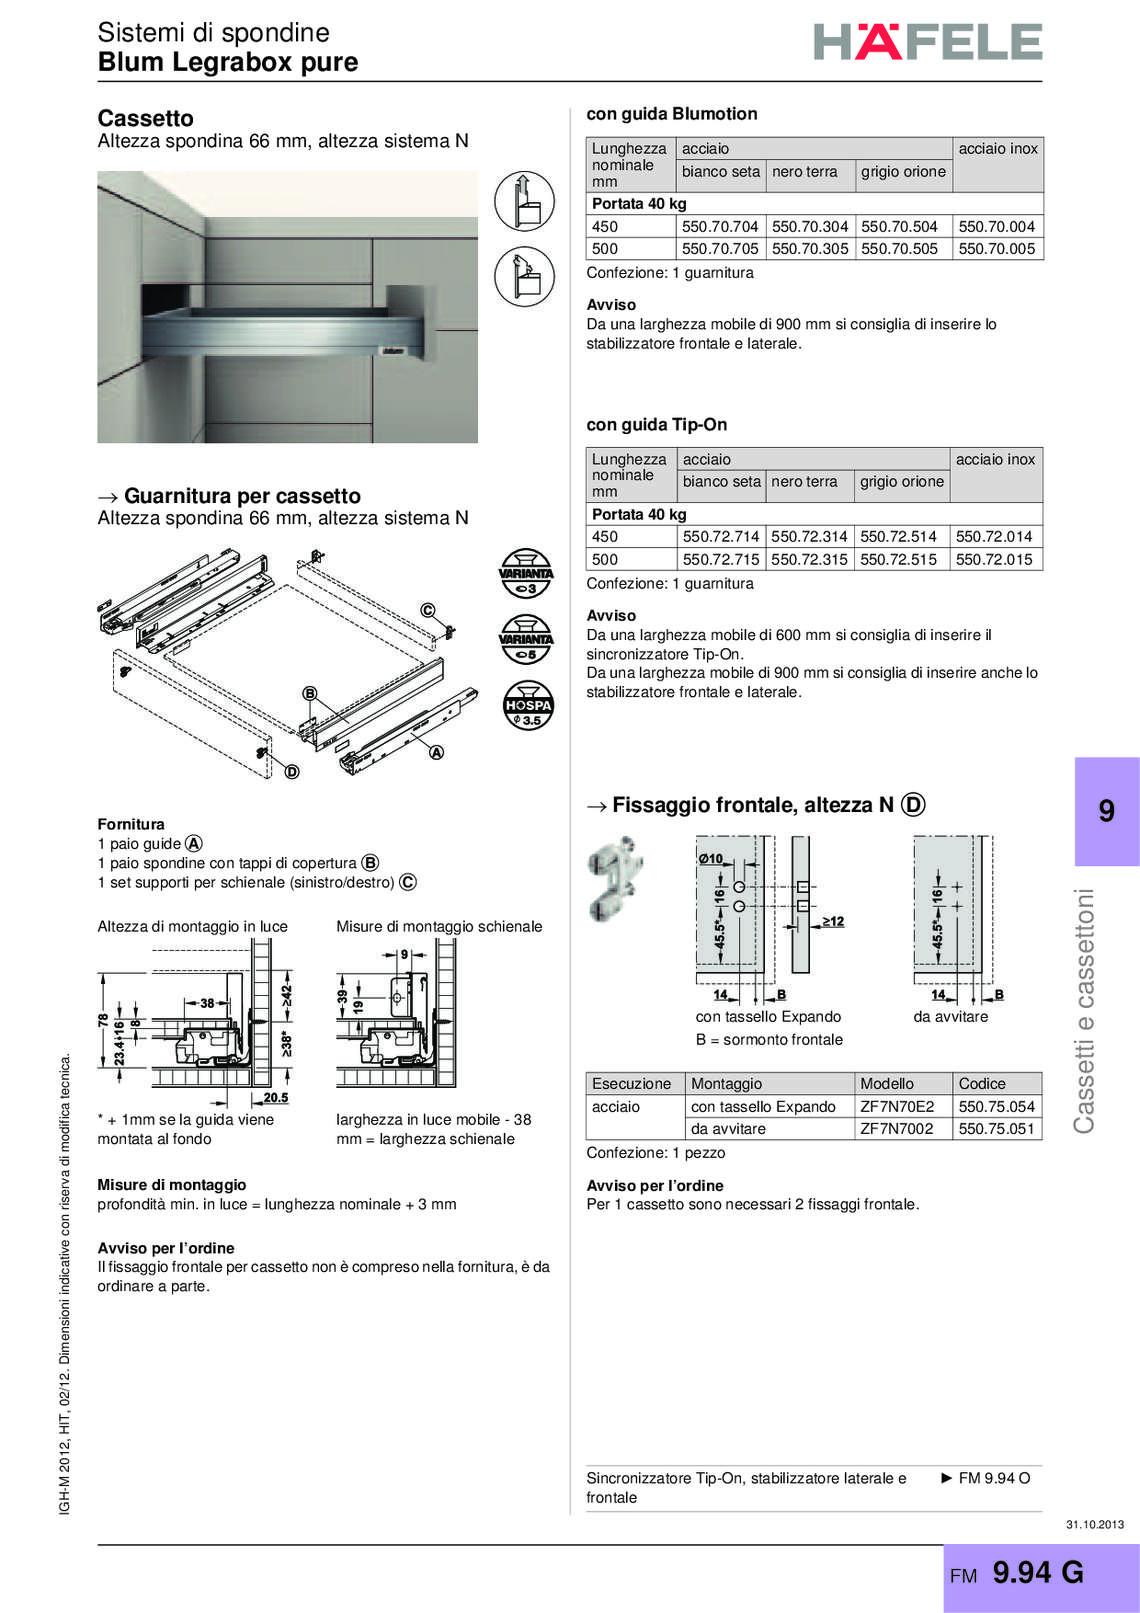 hafele-spondine-e-guide-per-mobili_40_124.jpg